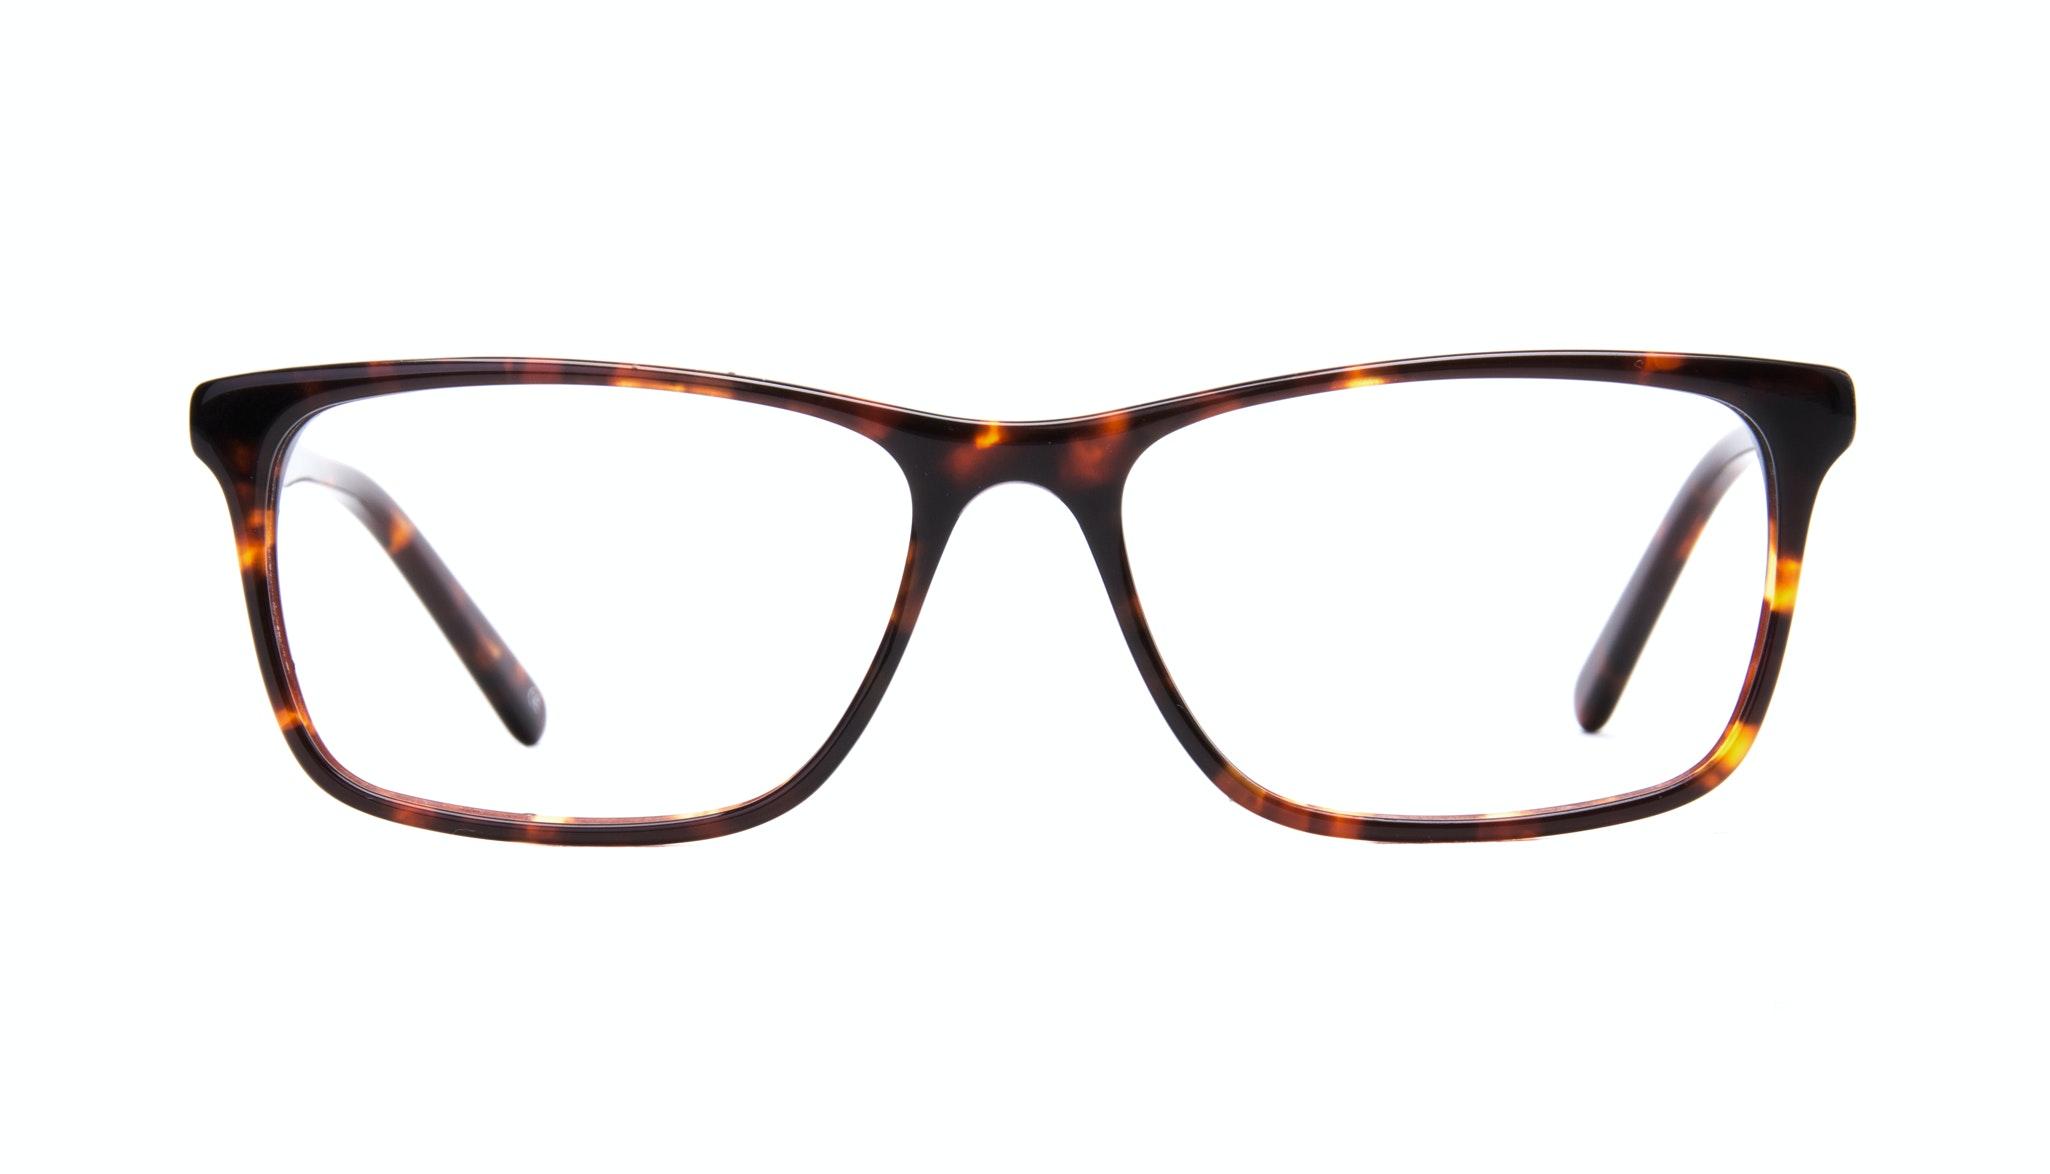 Affordable Fashion Glasses Rectangle Eyeglasses Men Henri Sepia Kiss